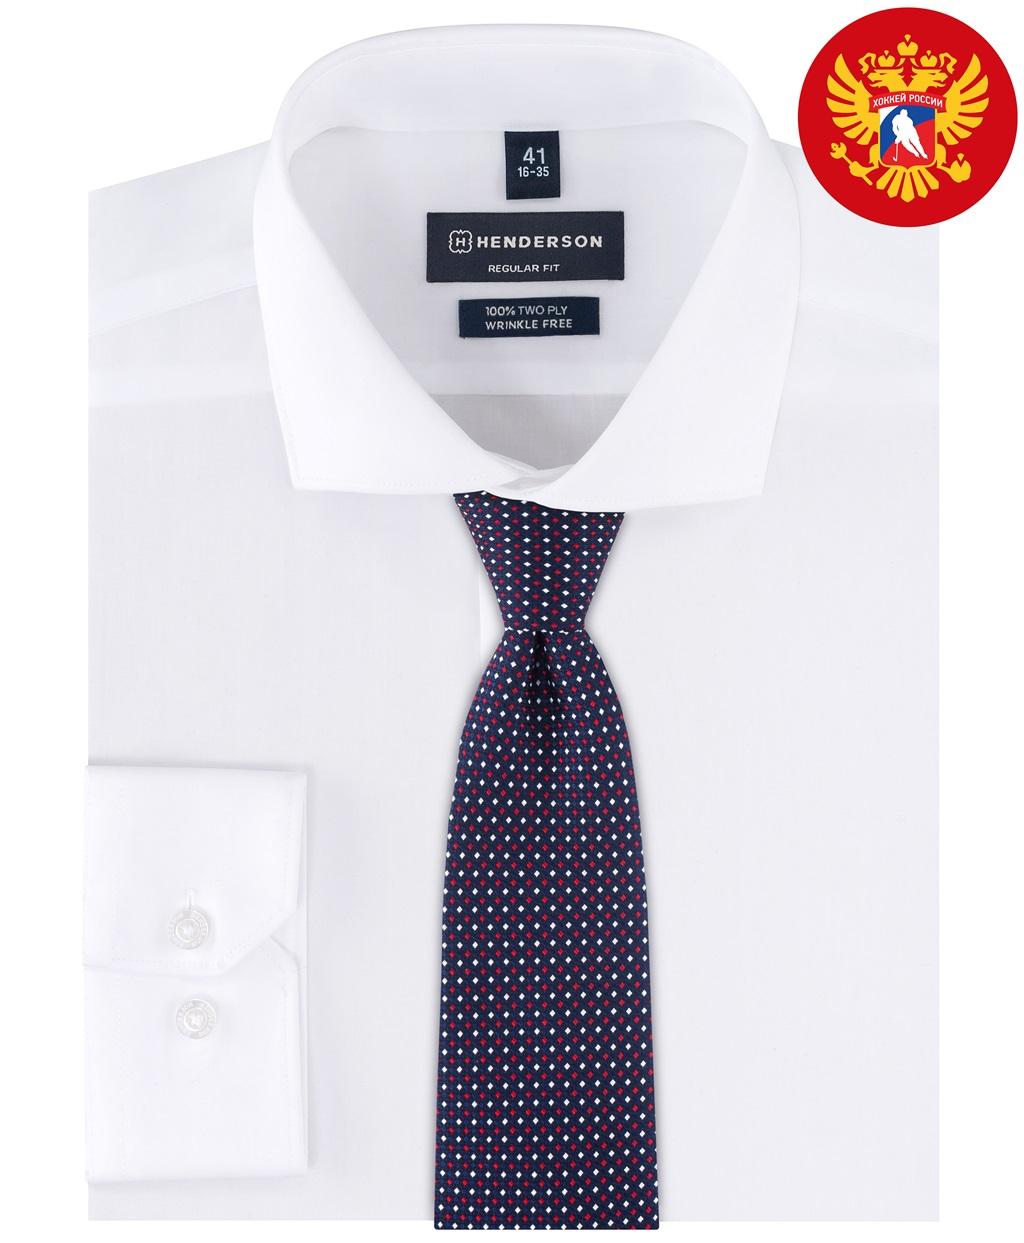 Рубашка прямой силуэт HENDERSON SHL-2053-N WHITE фото